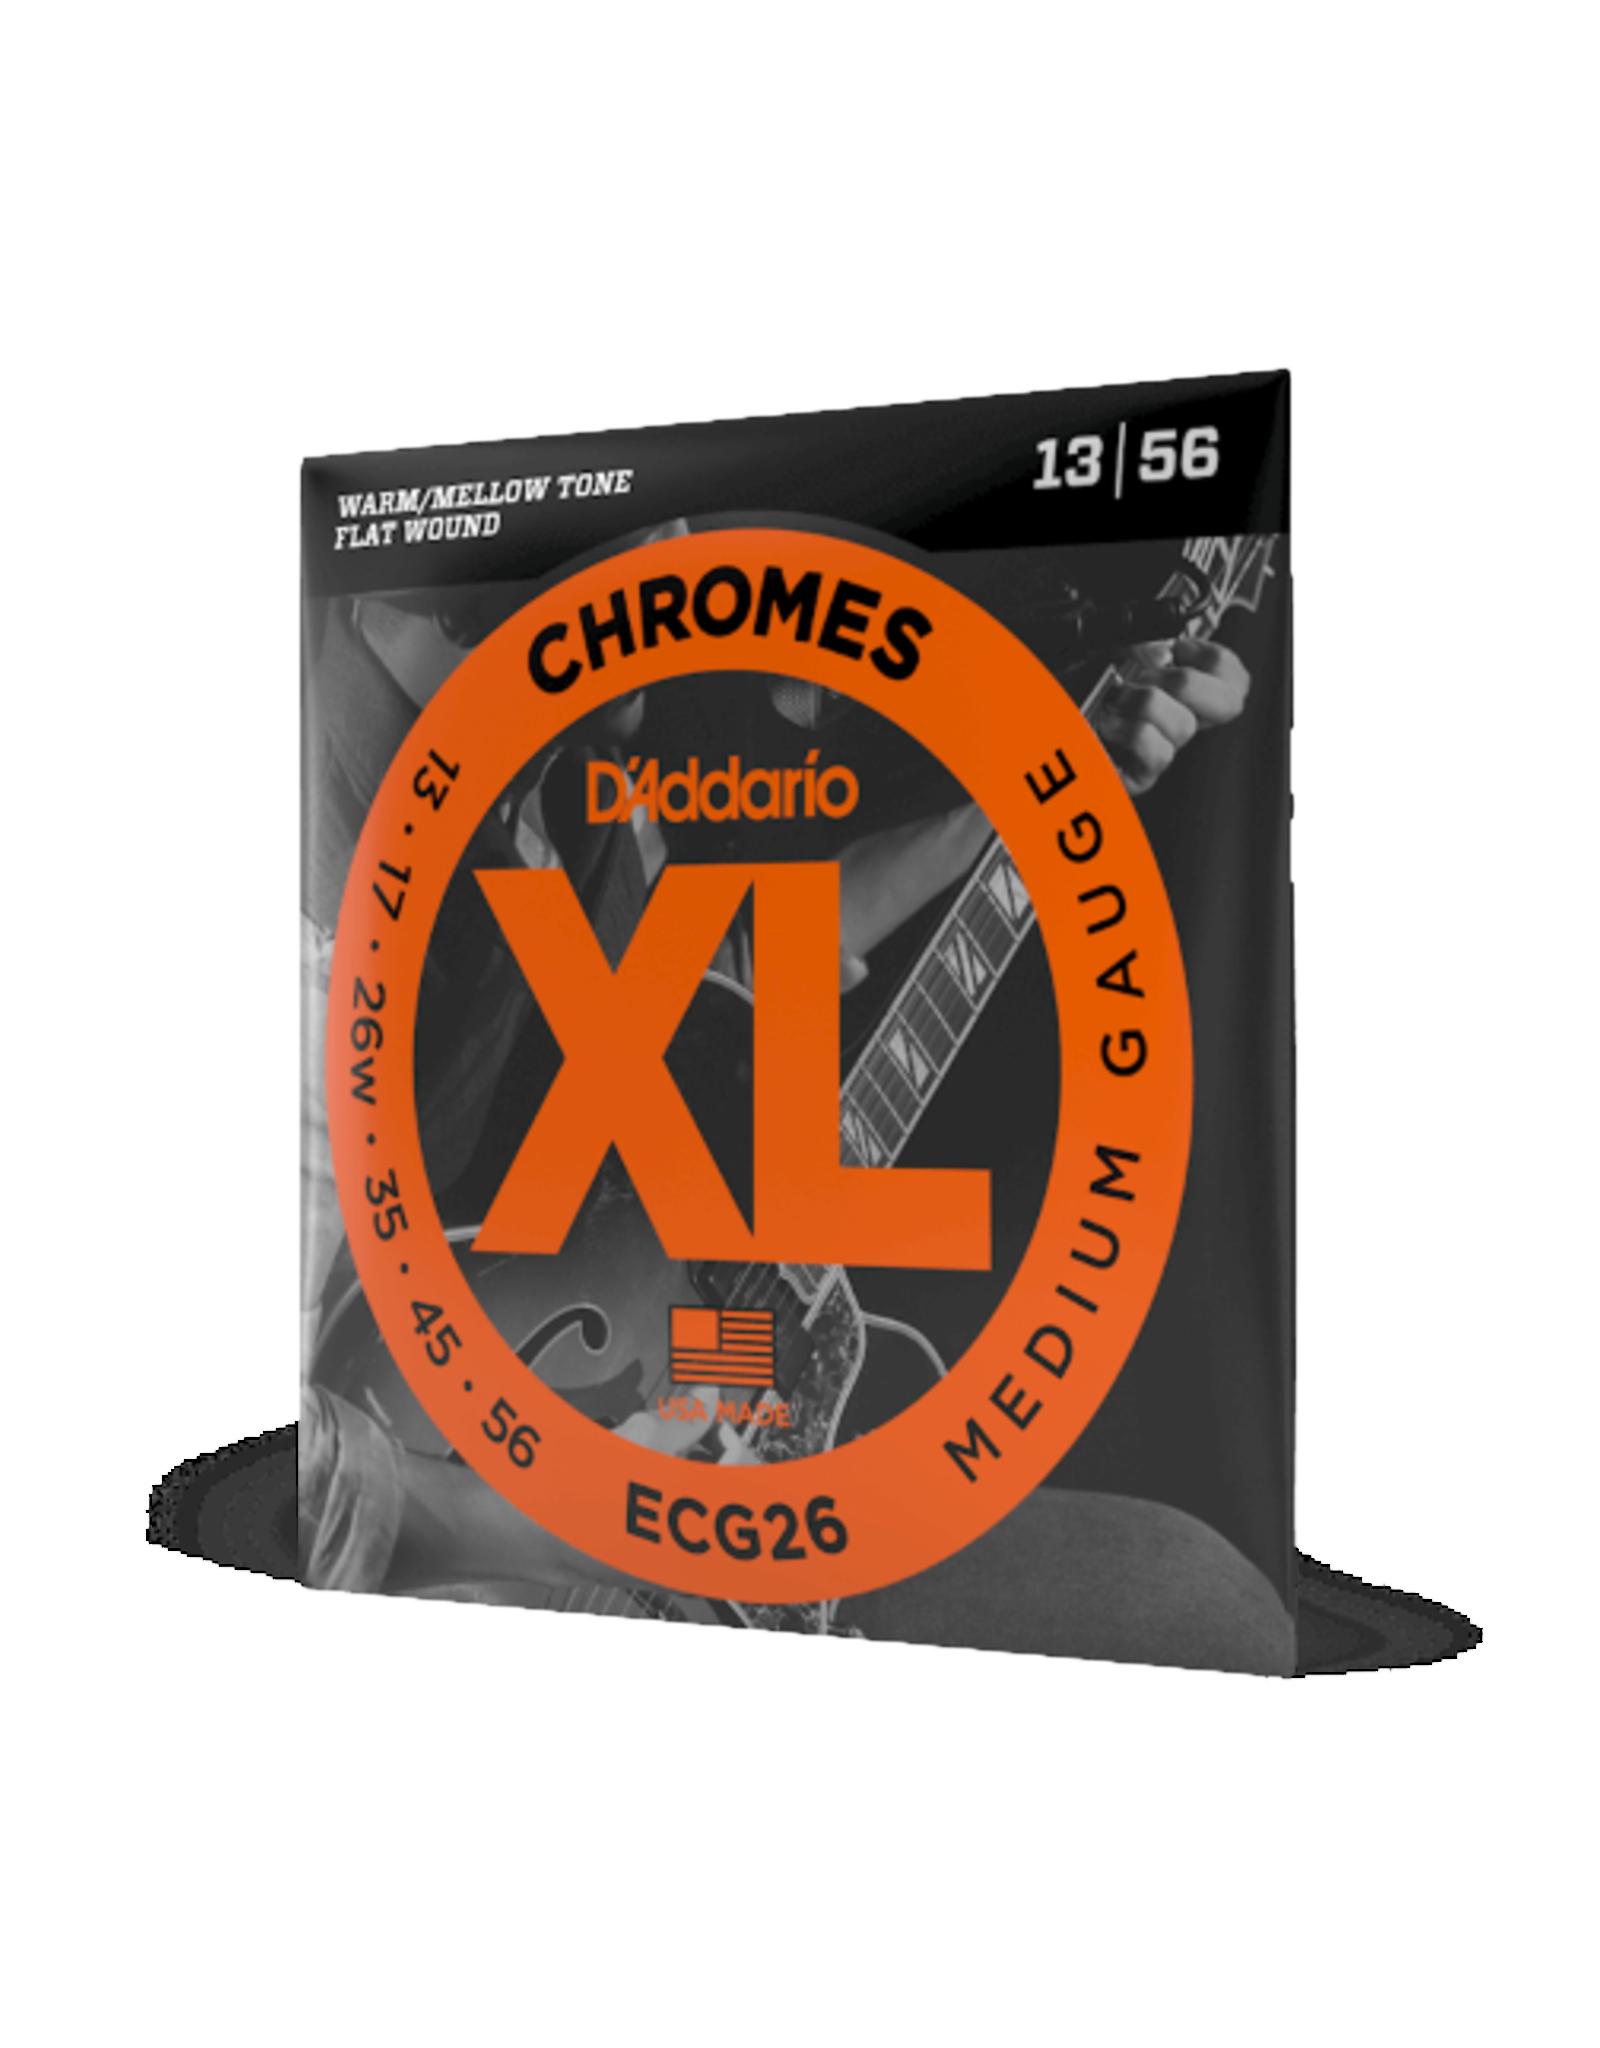 D'Addario D'Addario ECG26 Chromes Flat Wound Electric Guitar Strings, Medium, 13-56